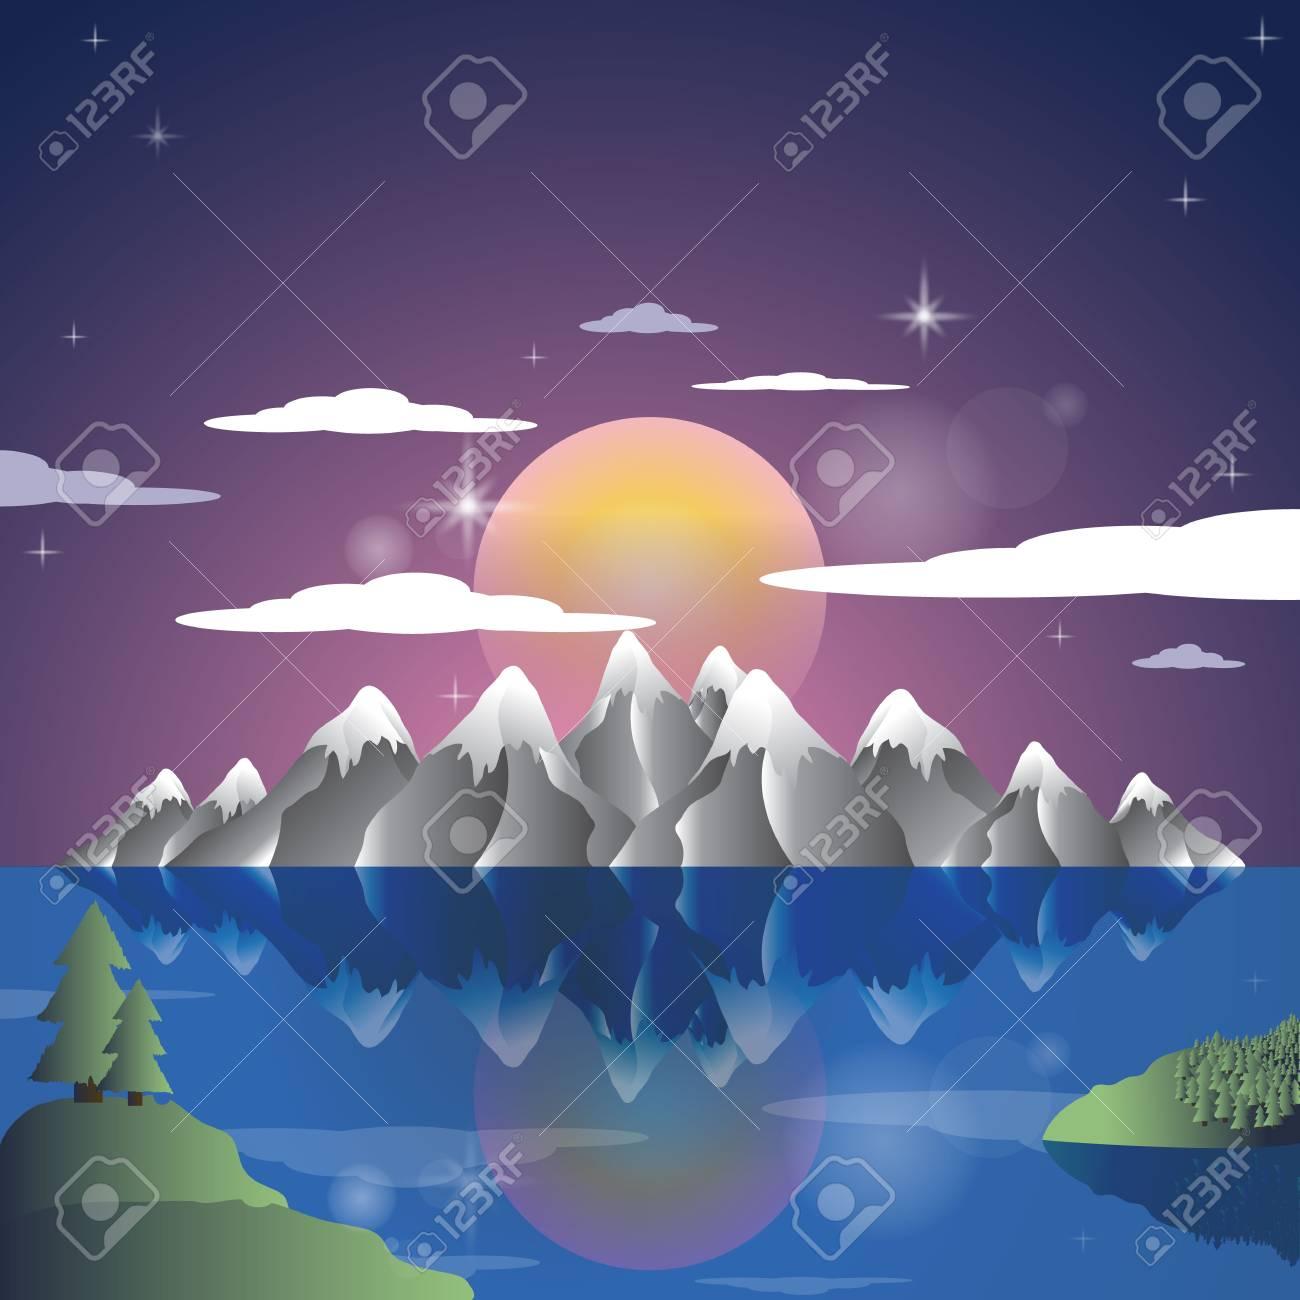 Alps Landscape sunset cartoon illustration background. Mountains vector. - 95150212